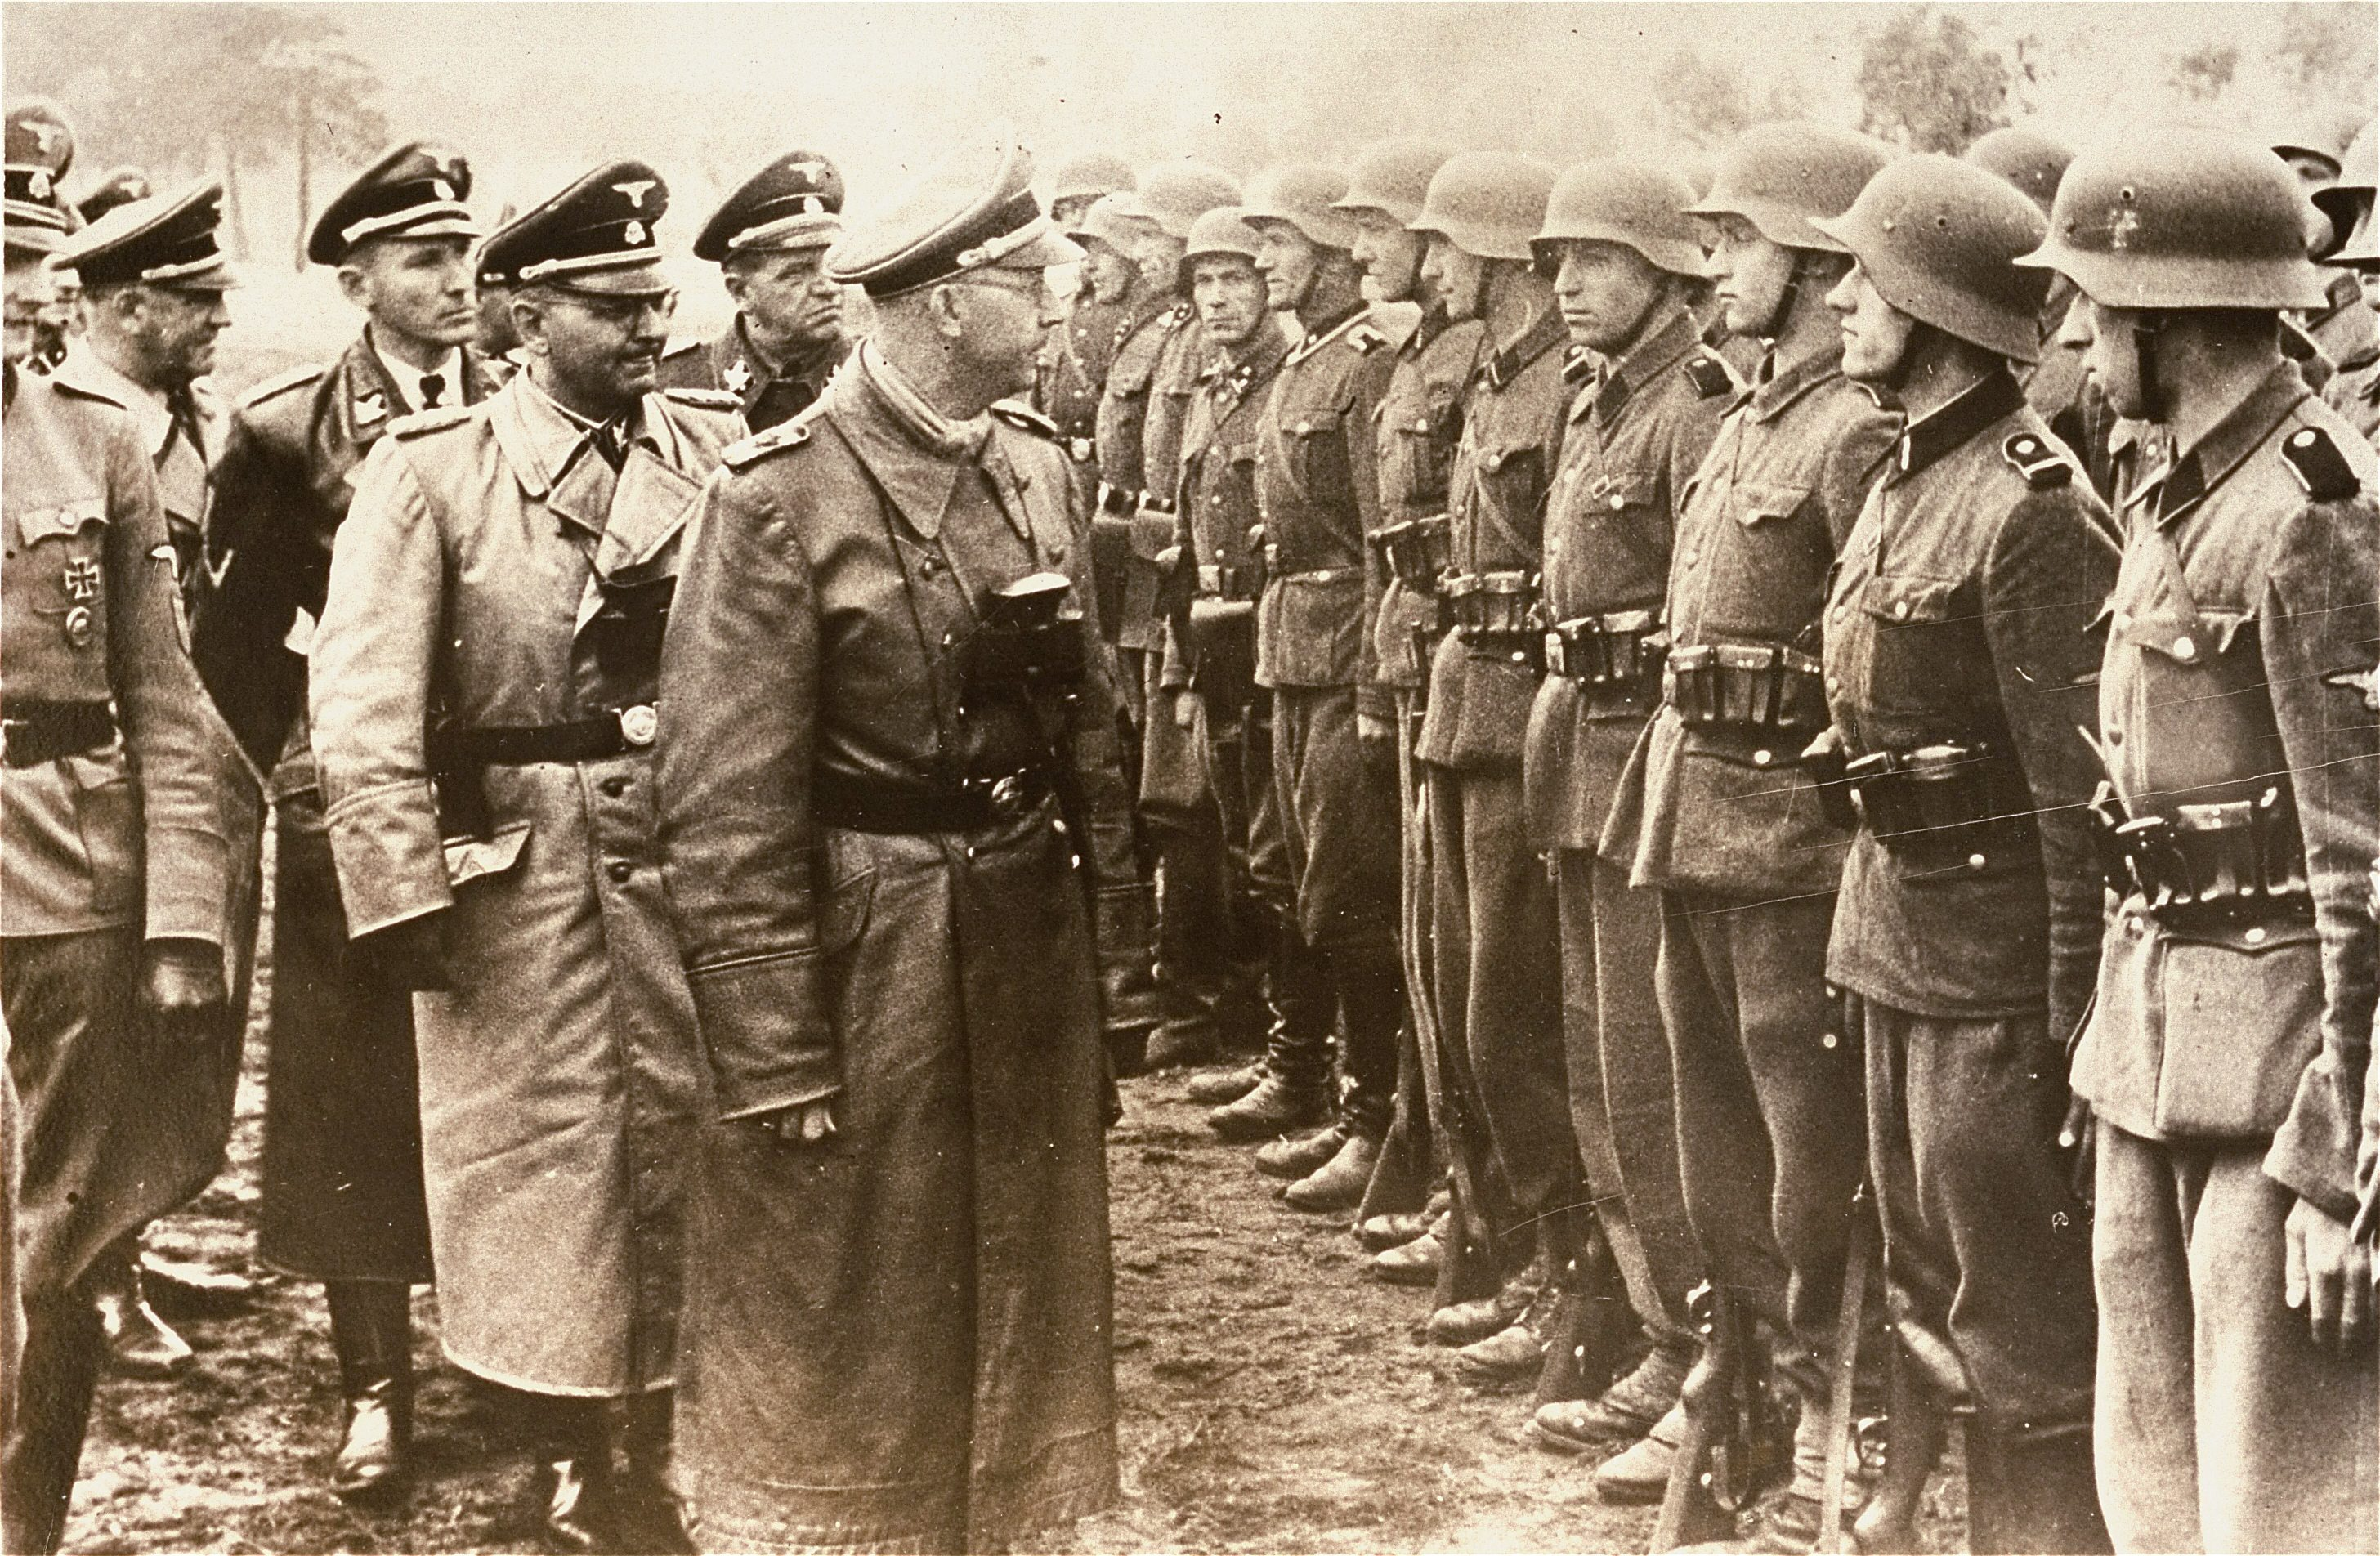 Писма на нациста Хайнрих Химлер са открити в Израел